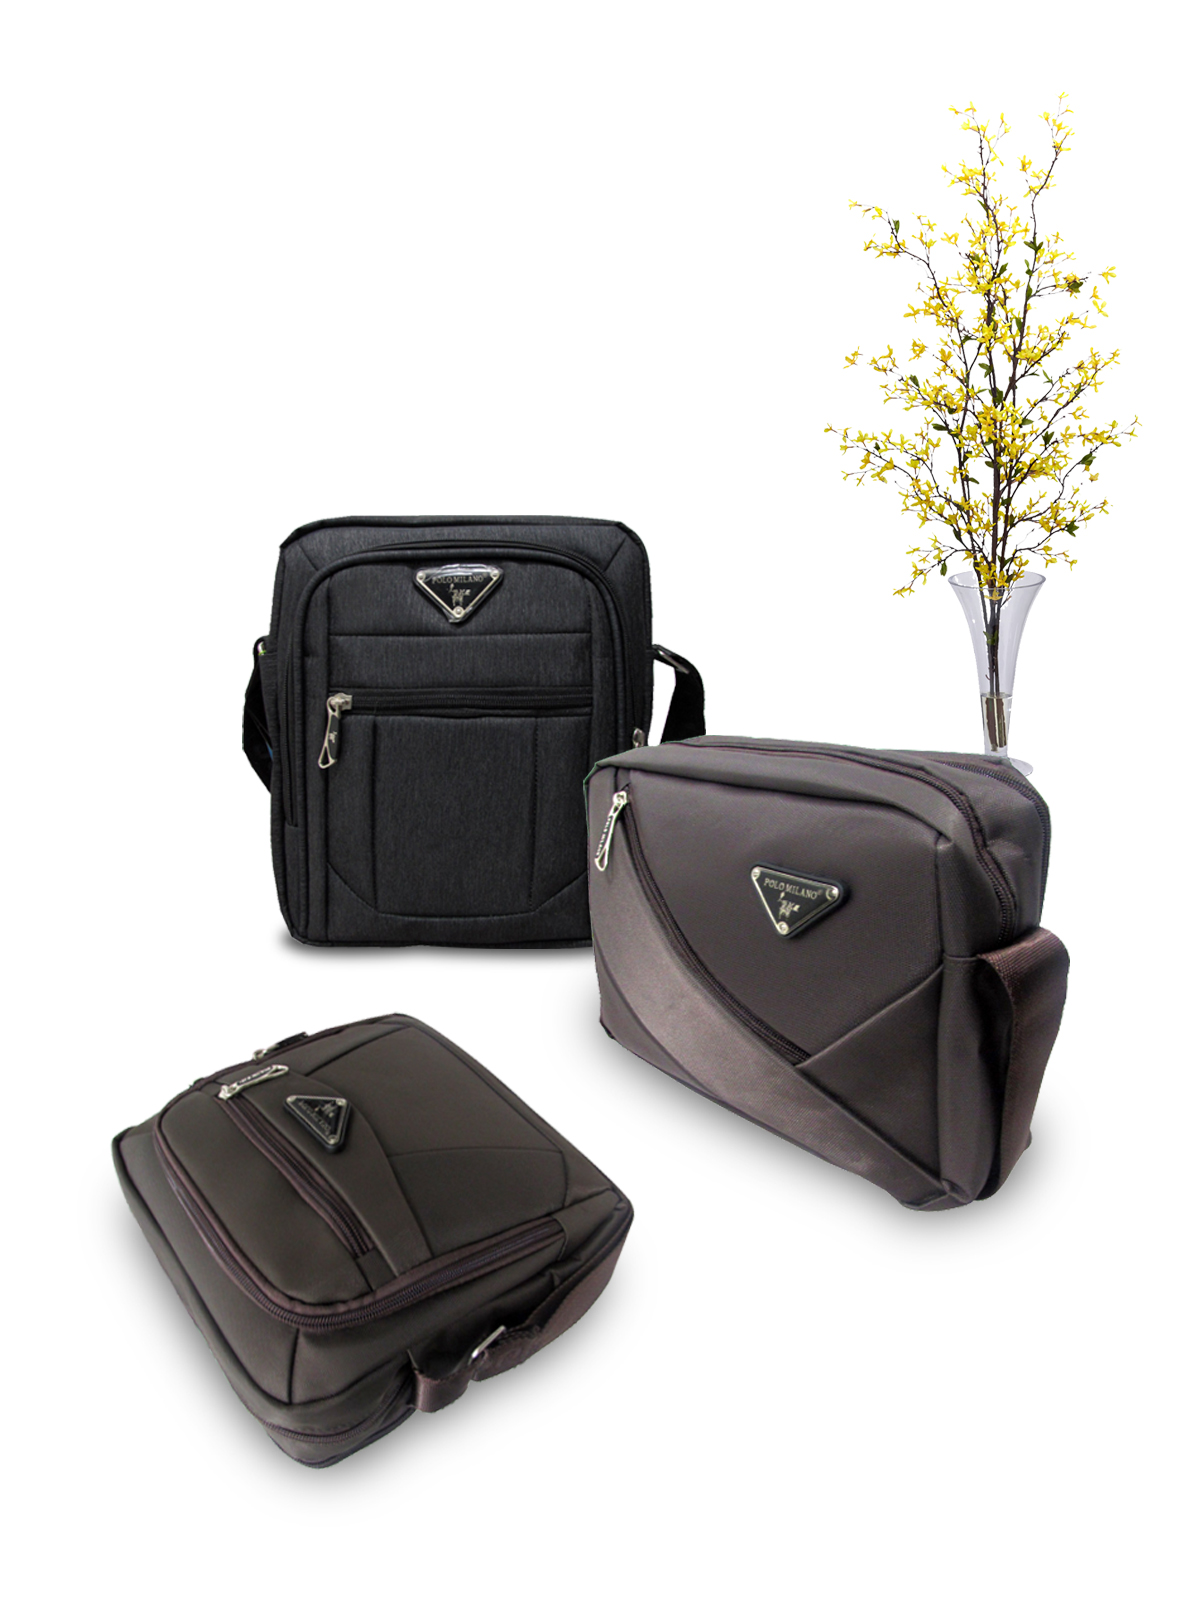 b0dab210baa4 PROMO Cuci Gudang Sling Bag 10 Inch Polo Milano    Polo Milano